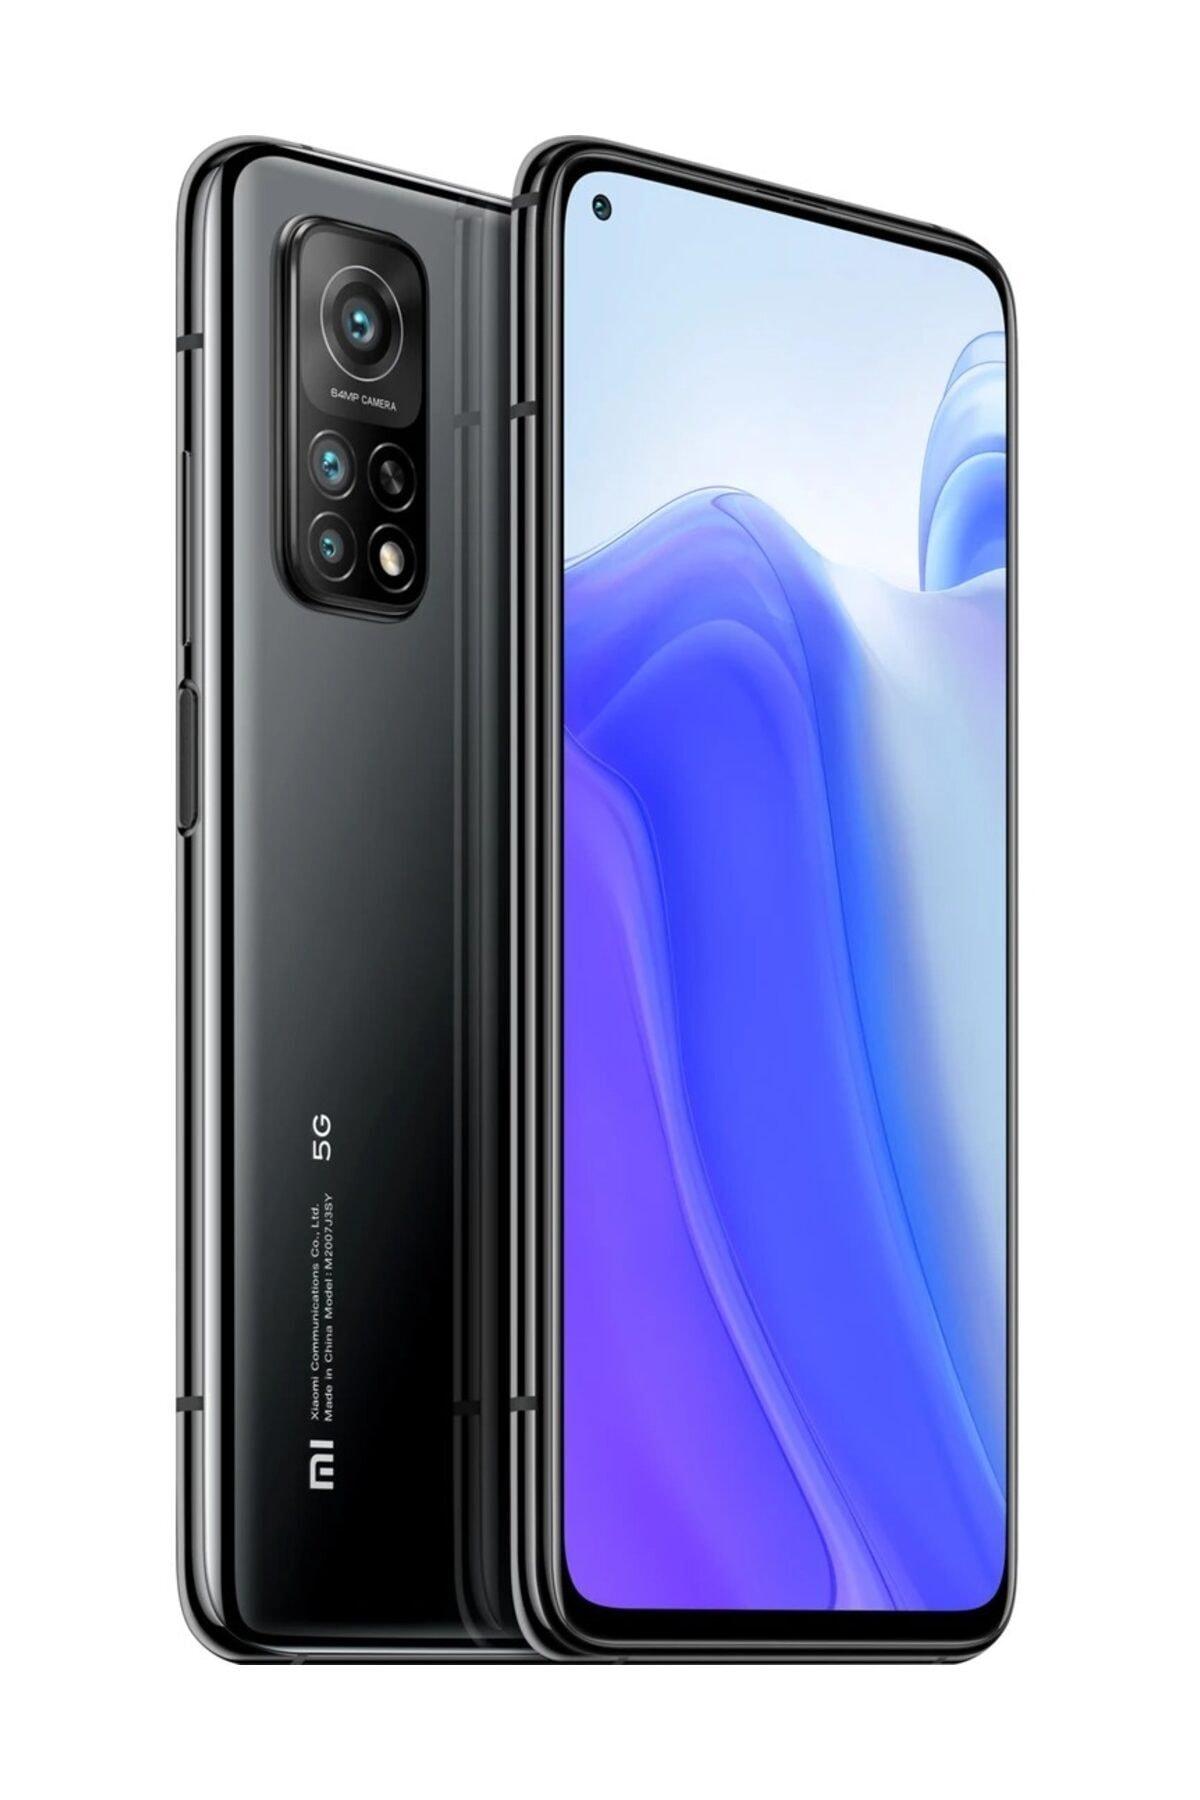 Xiaomi Mi 10T 5G 8GB + 128 GB Siyah Cep Telefonu (Xiaomi Türkiye Garantili) 1